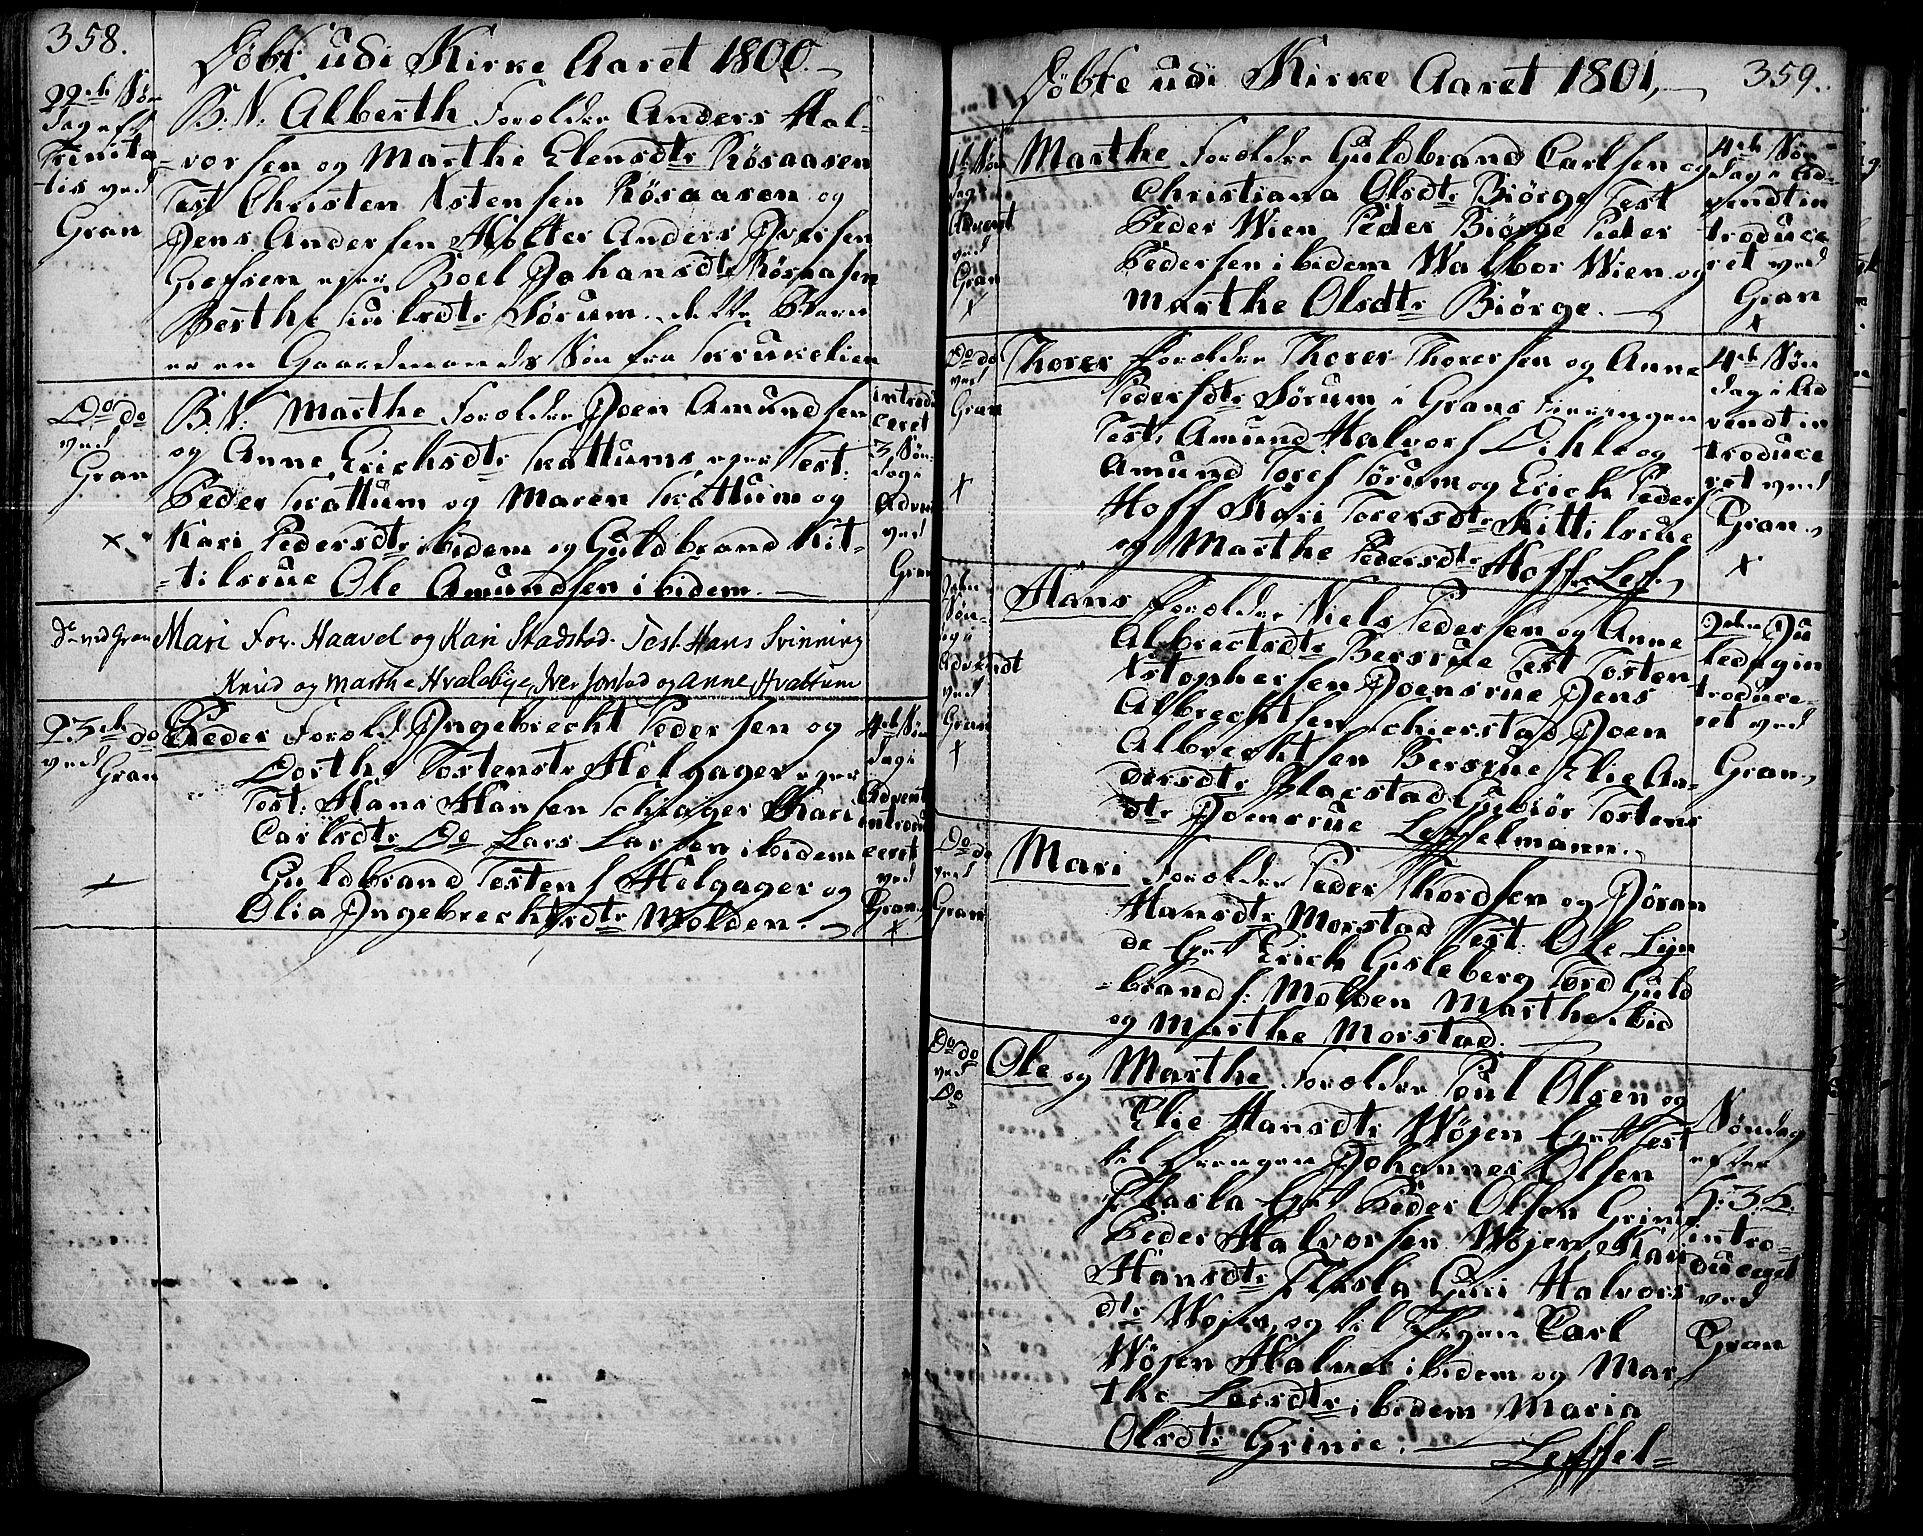 SAH, Gran prestekontor, Ministerialbok nr. 6, 1787-1824, s. 358-359